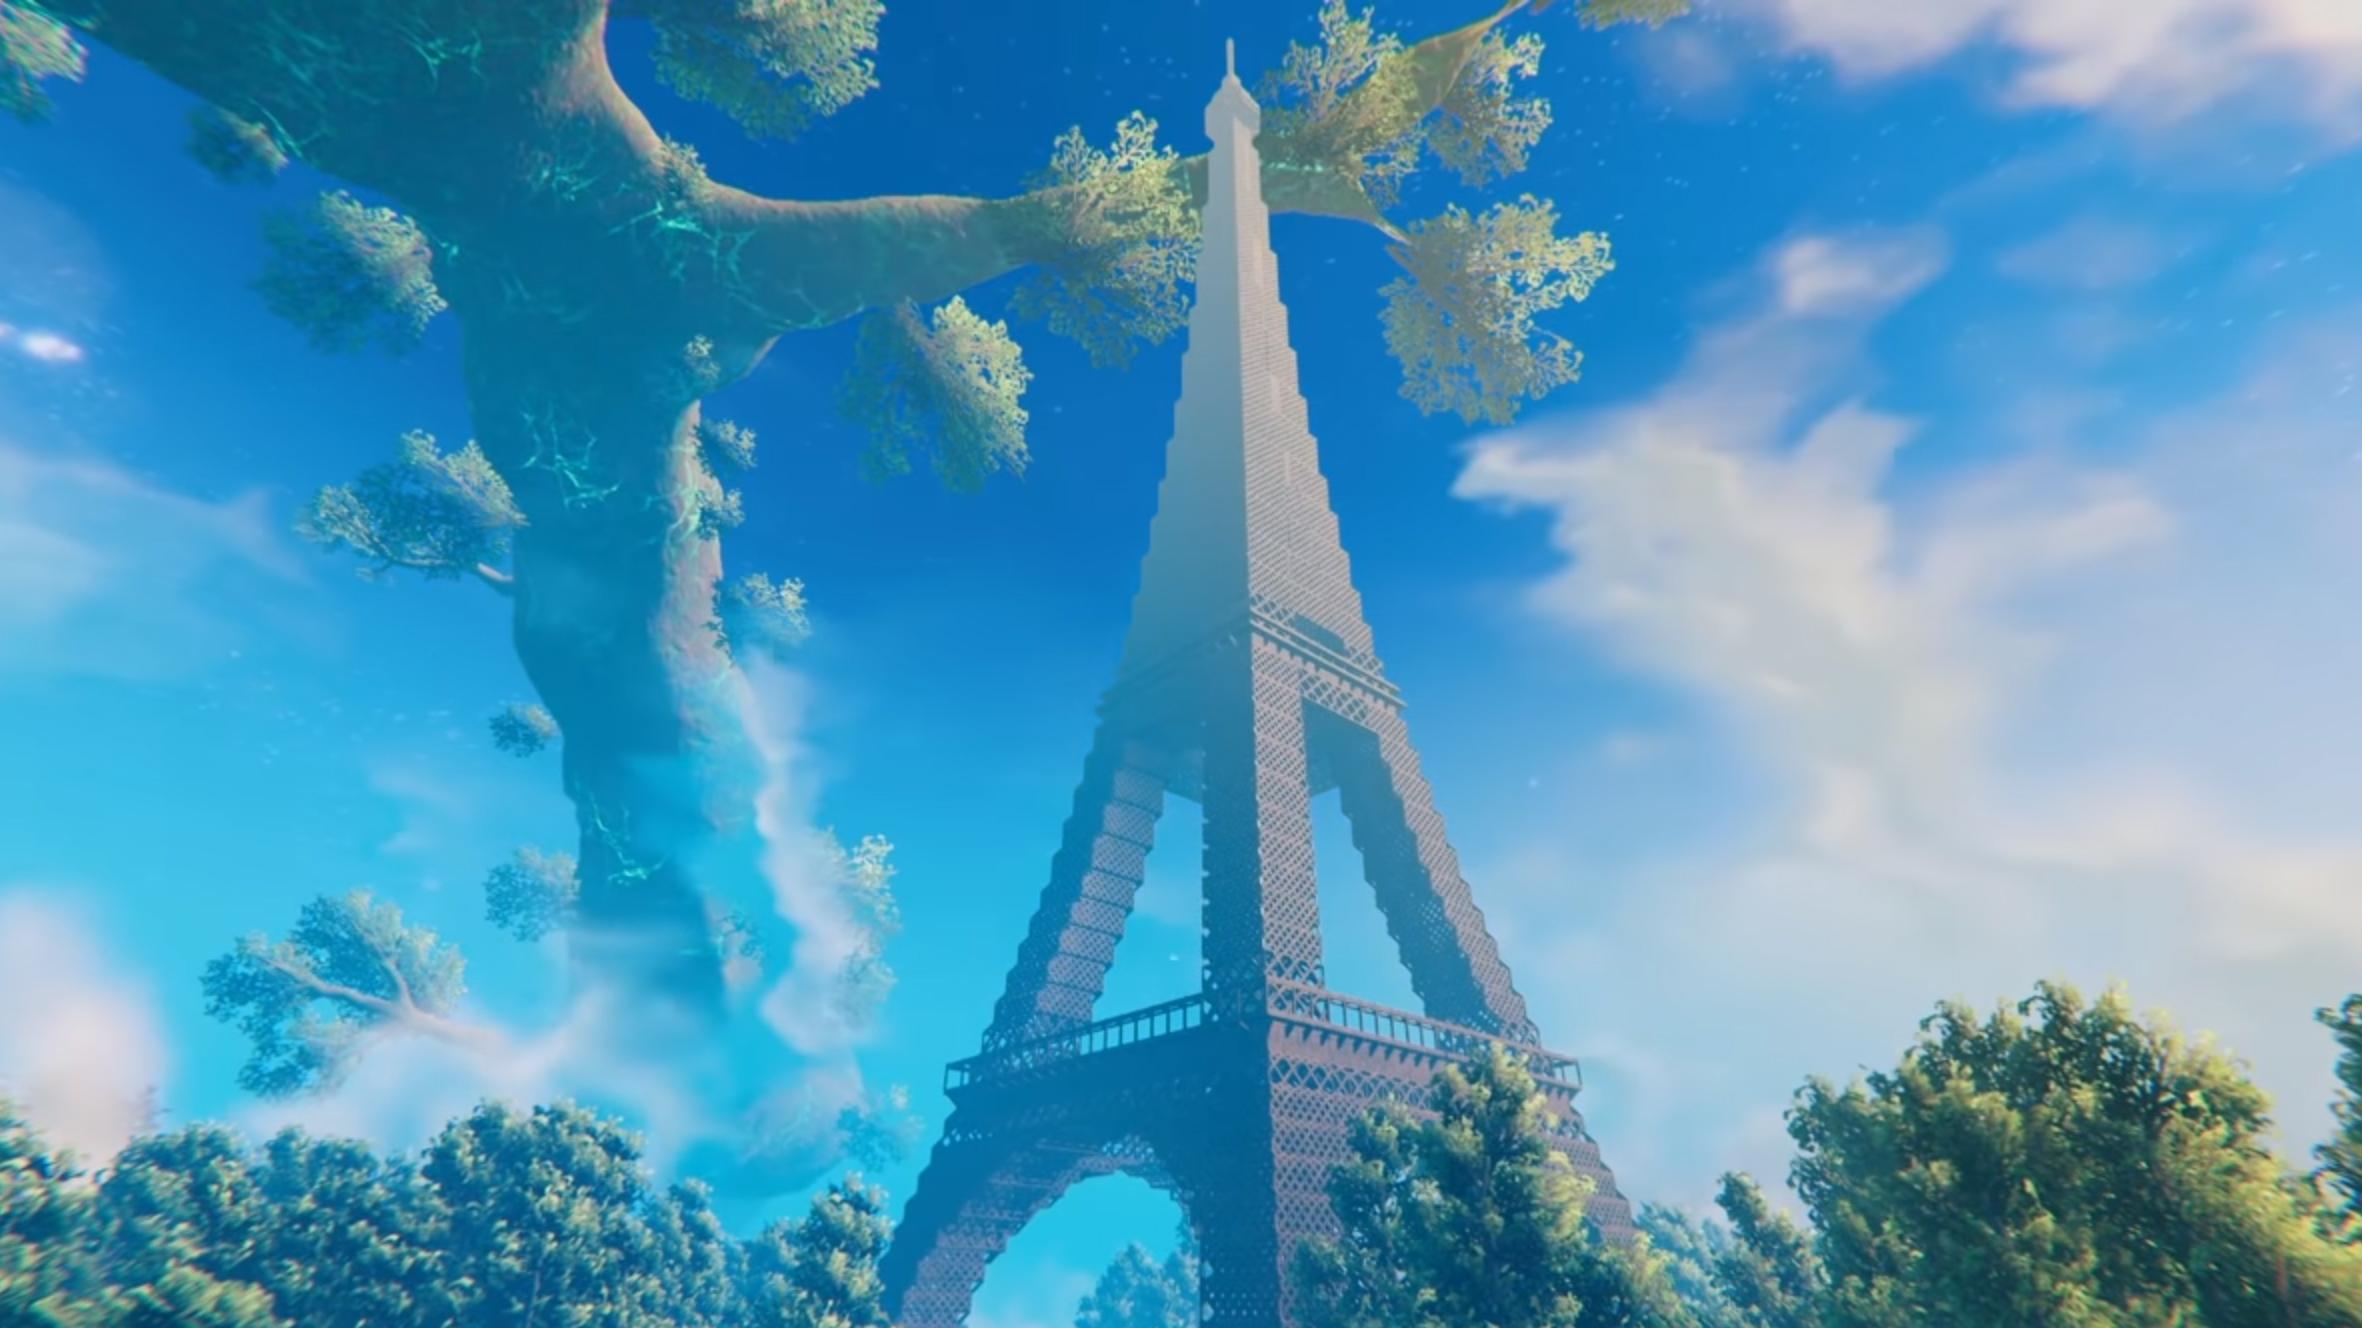 Valheim players use 40,000 blocks to build a massive Eiffel Tower